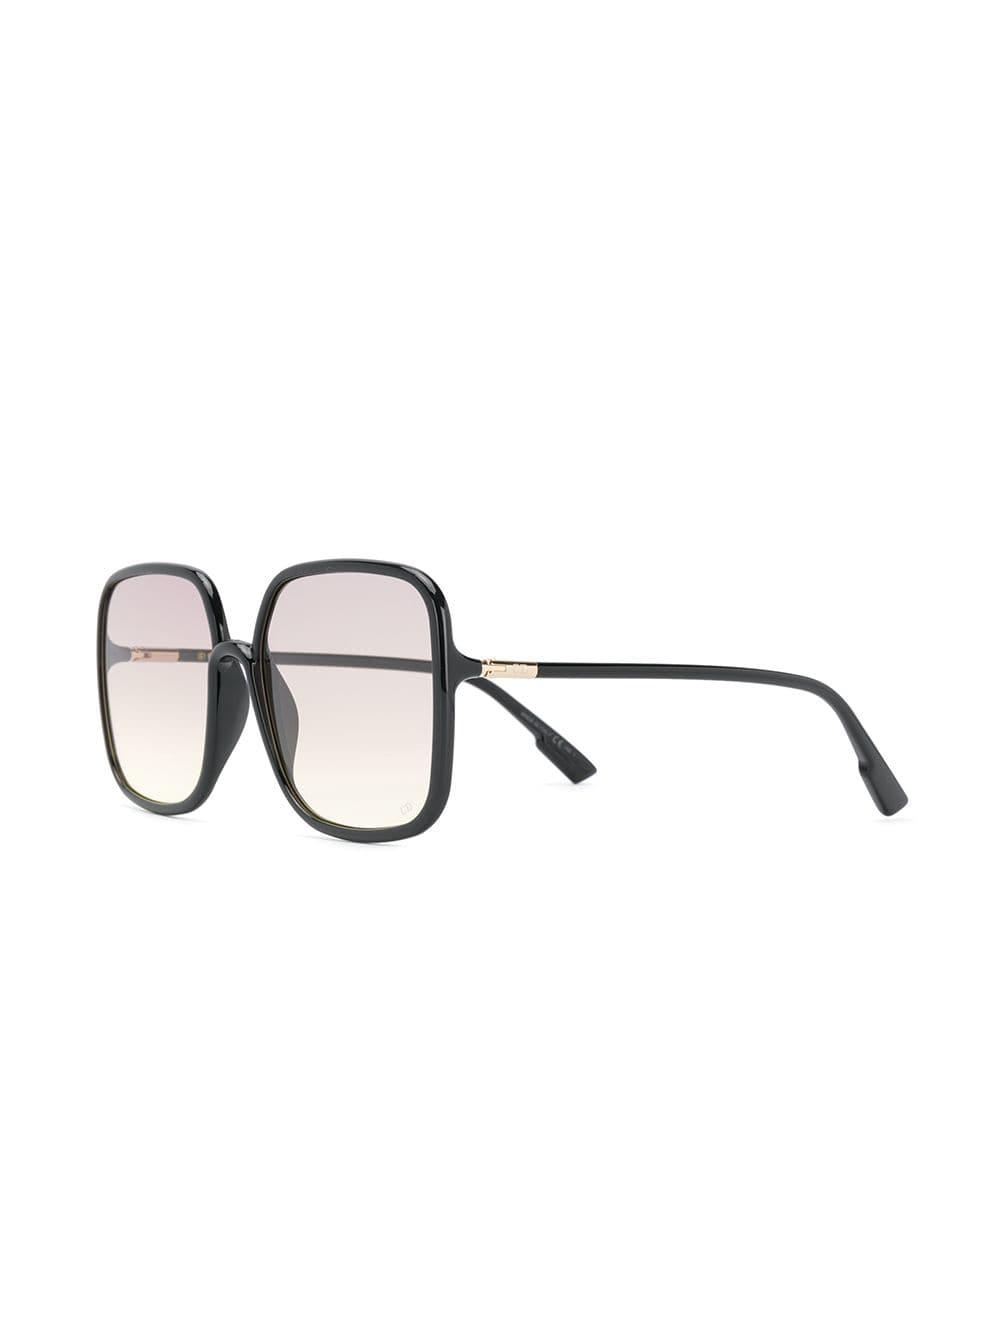 6429d41bc352c Dior Sostellaire1 Glasses in Black - Lyst